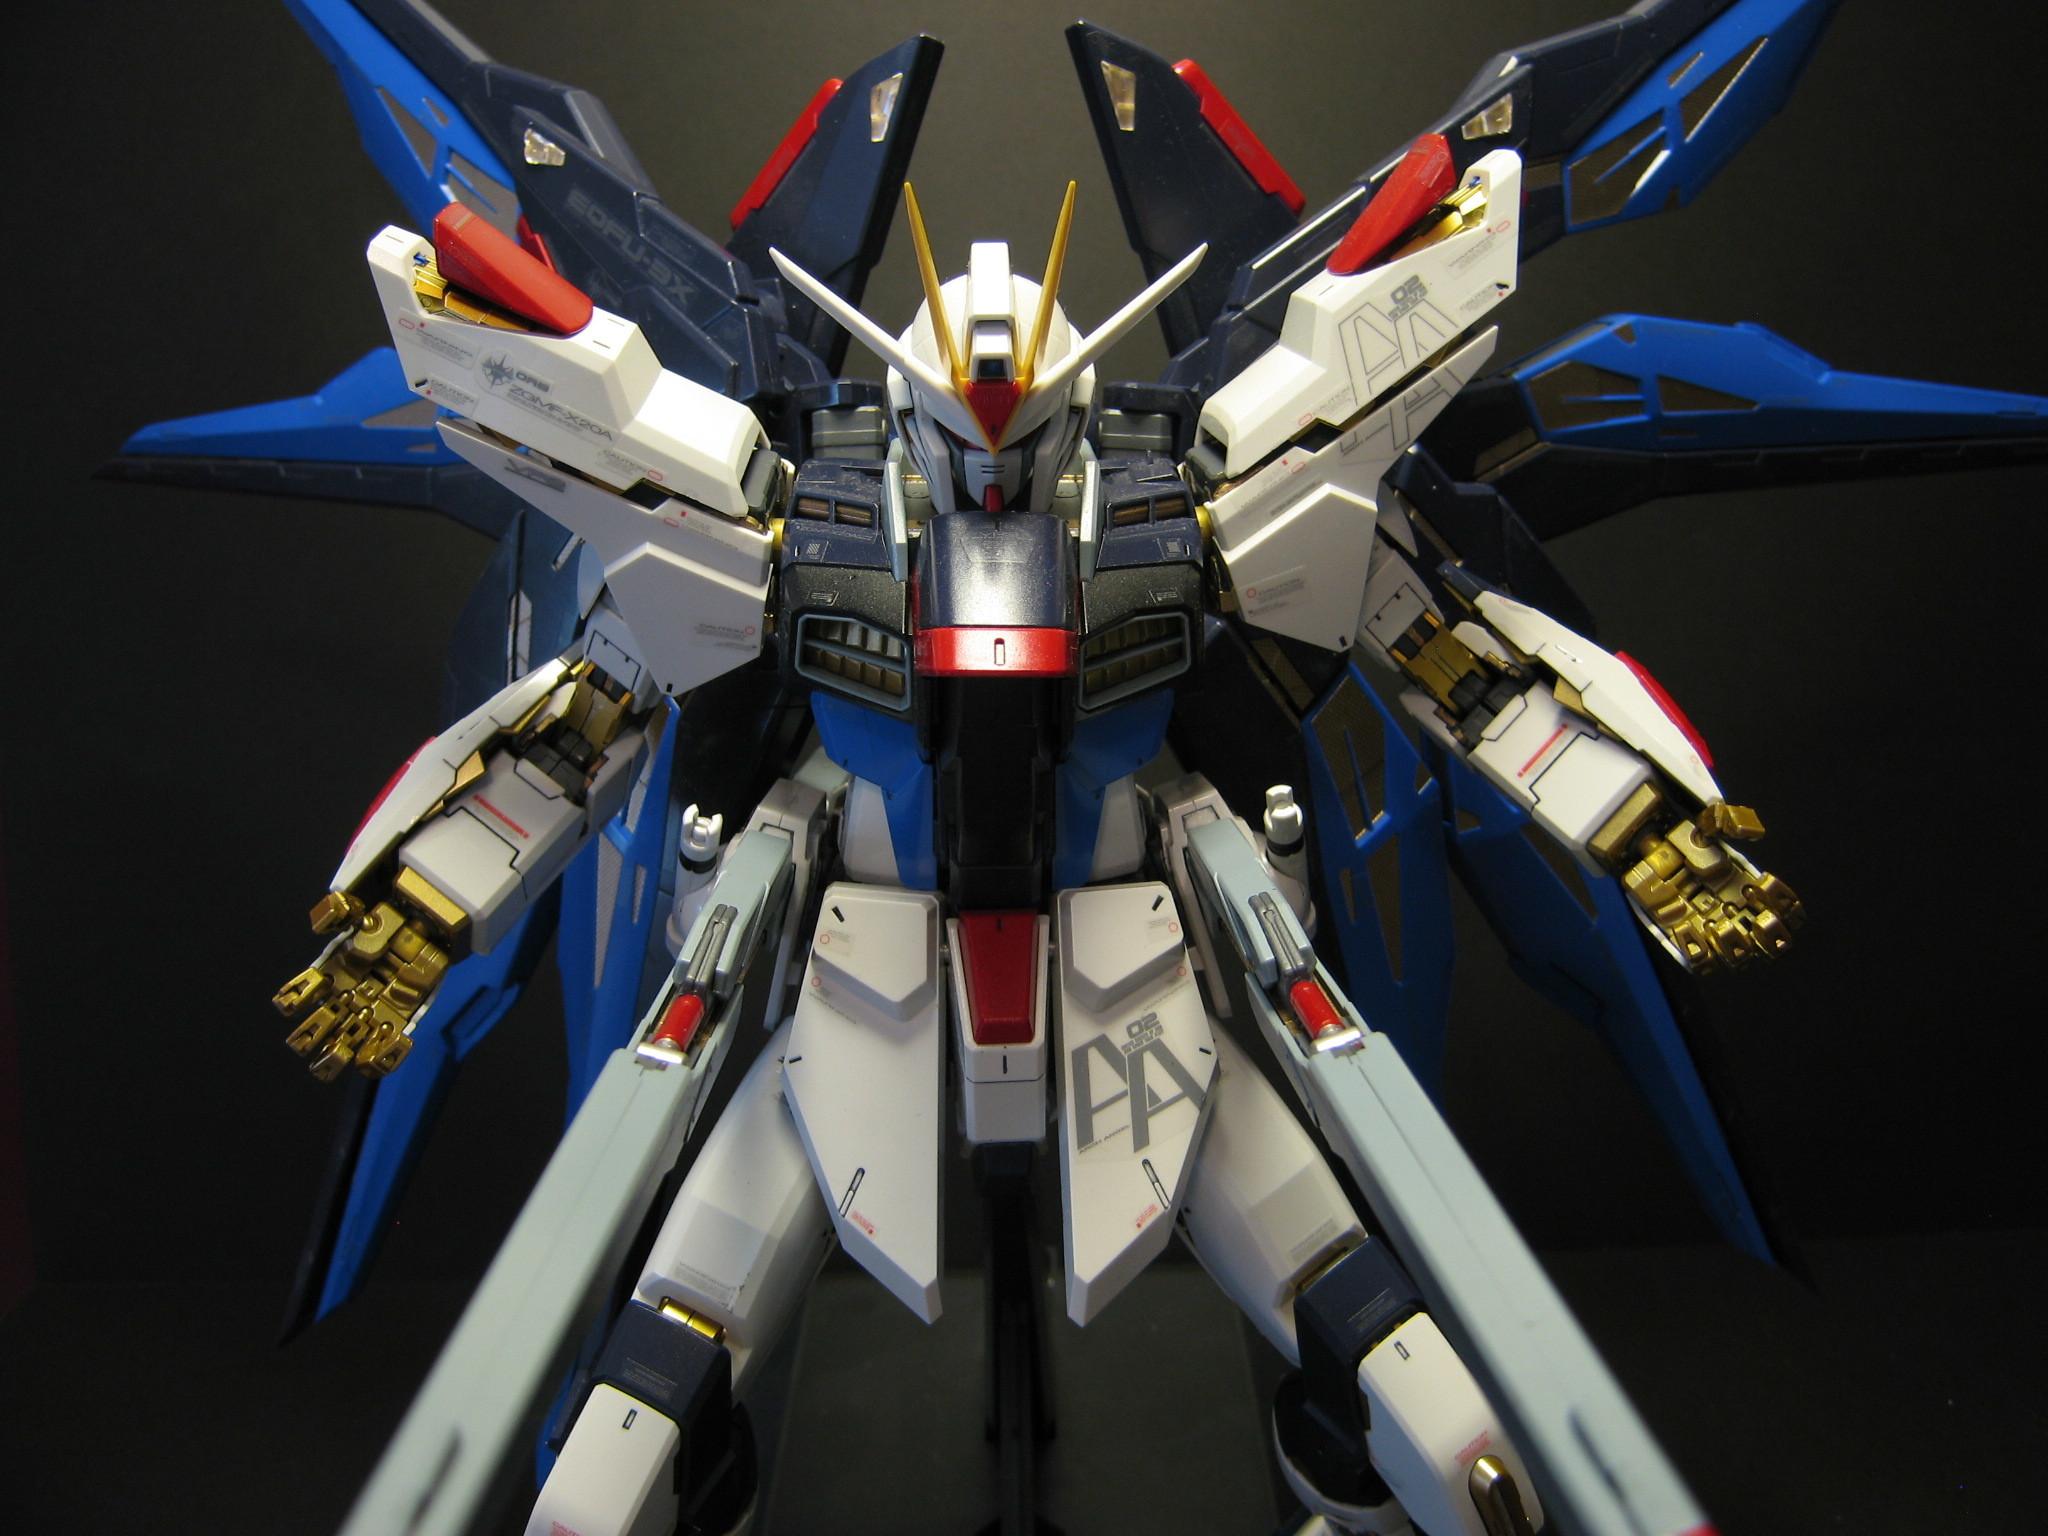 Gundam Strikedom Wallpaper Hd